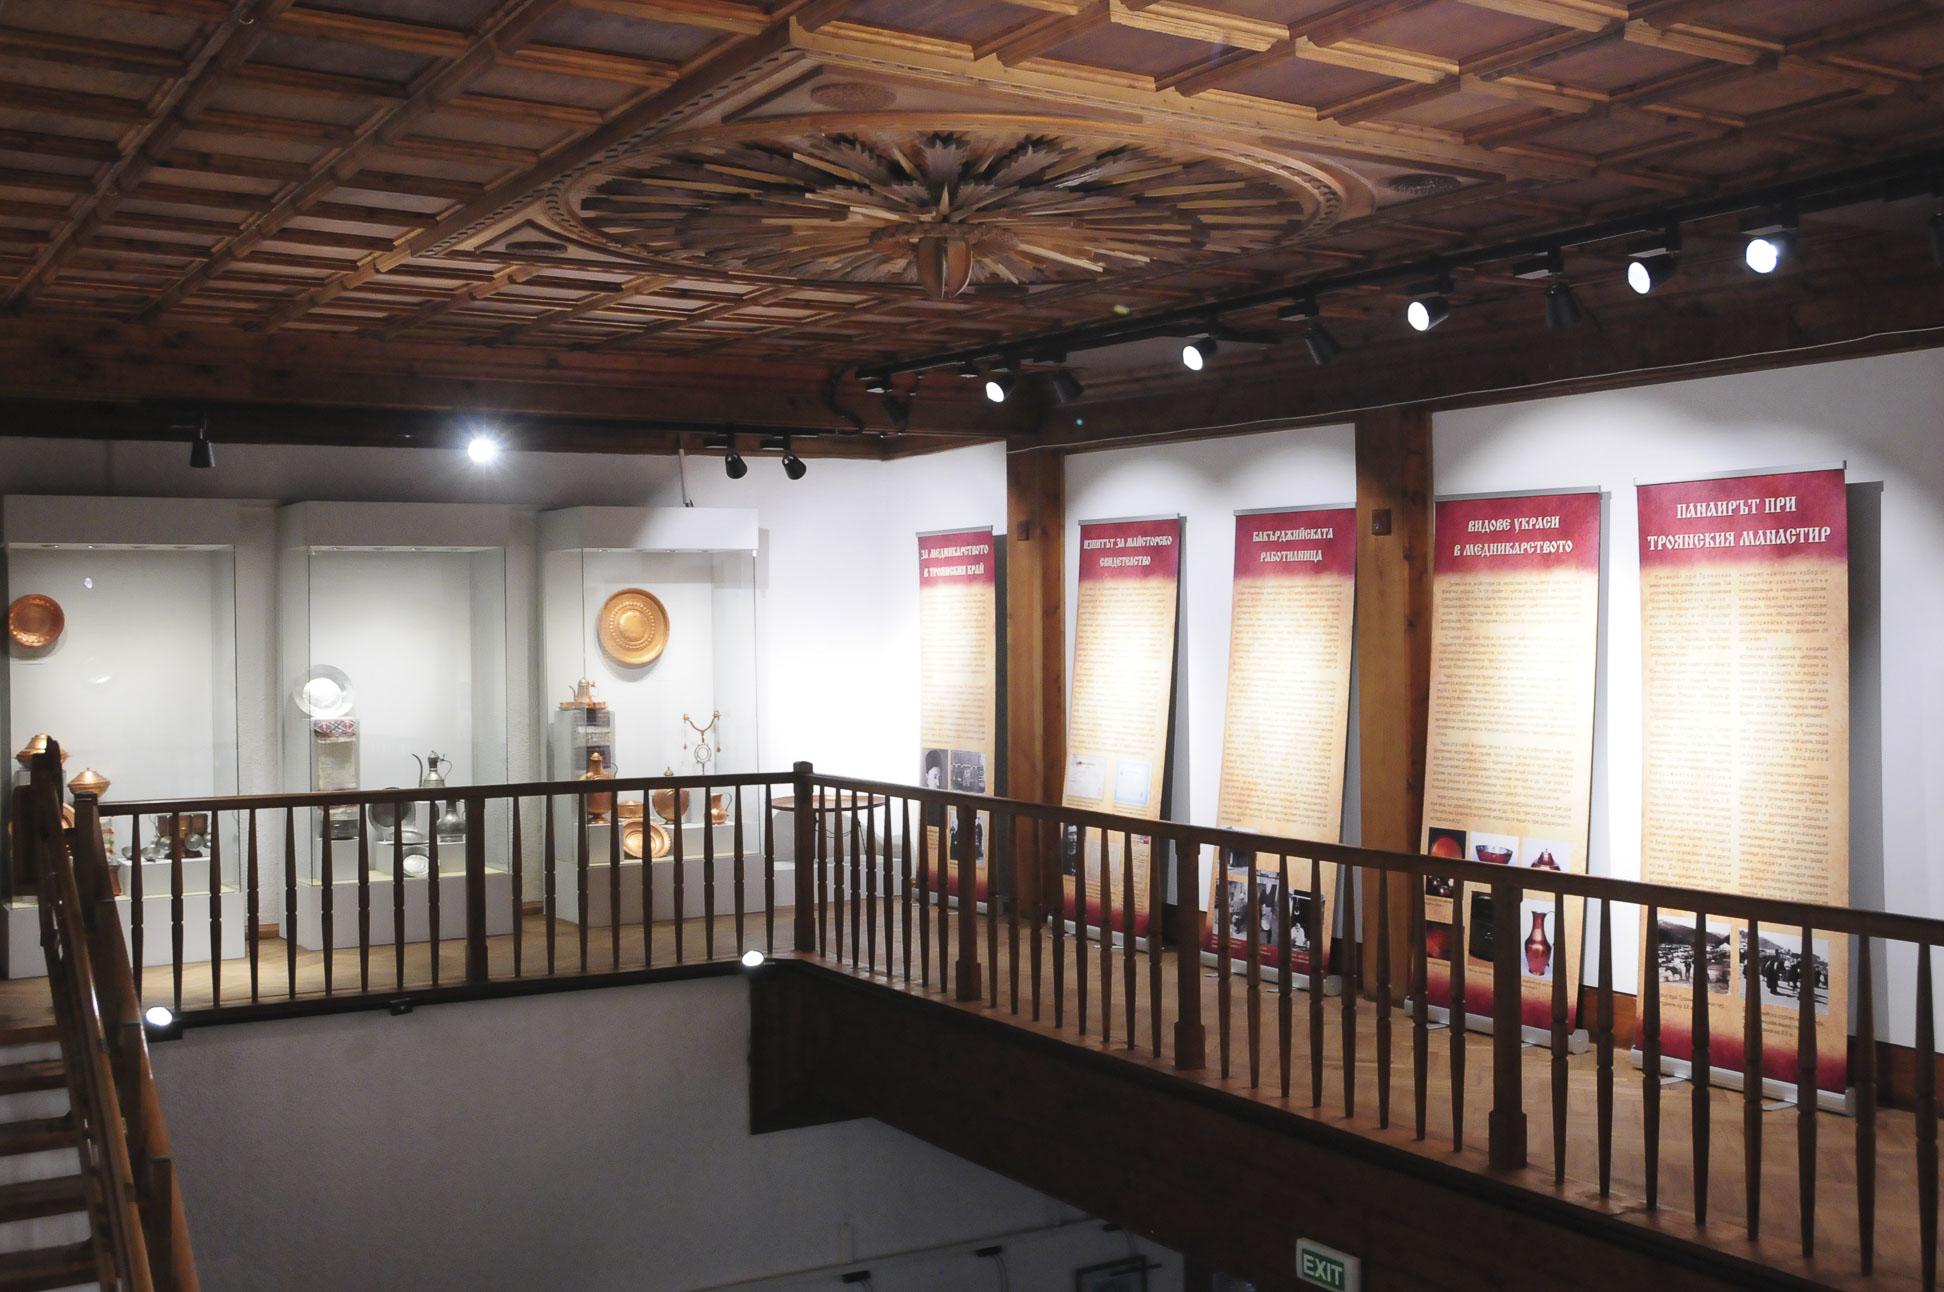 troyan-museum-mednikarstvo-ot-troyanskiq-krai-27